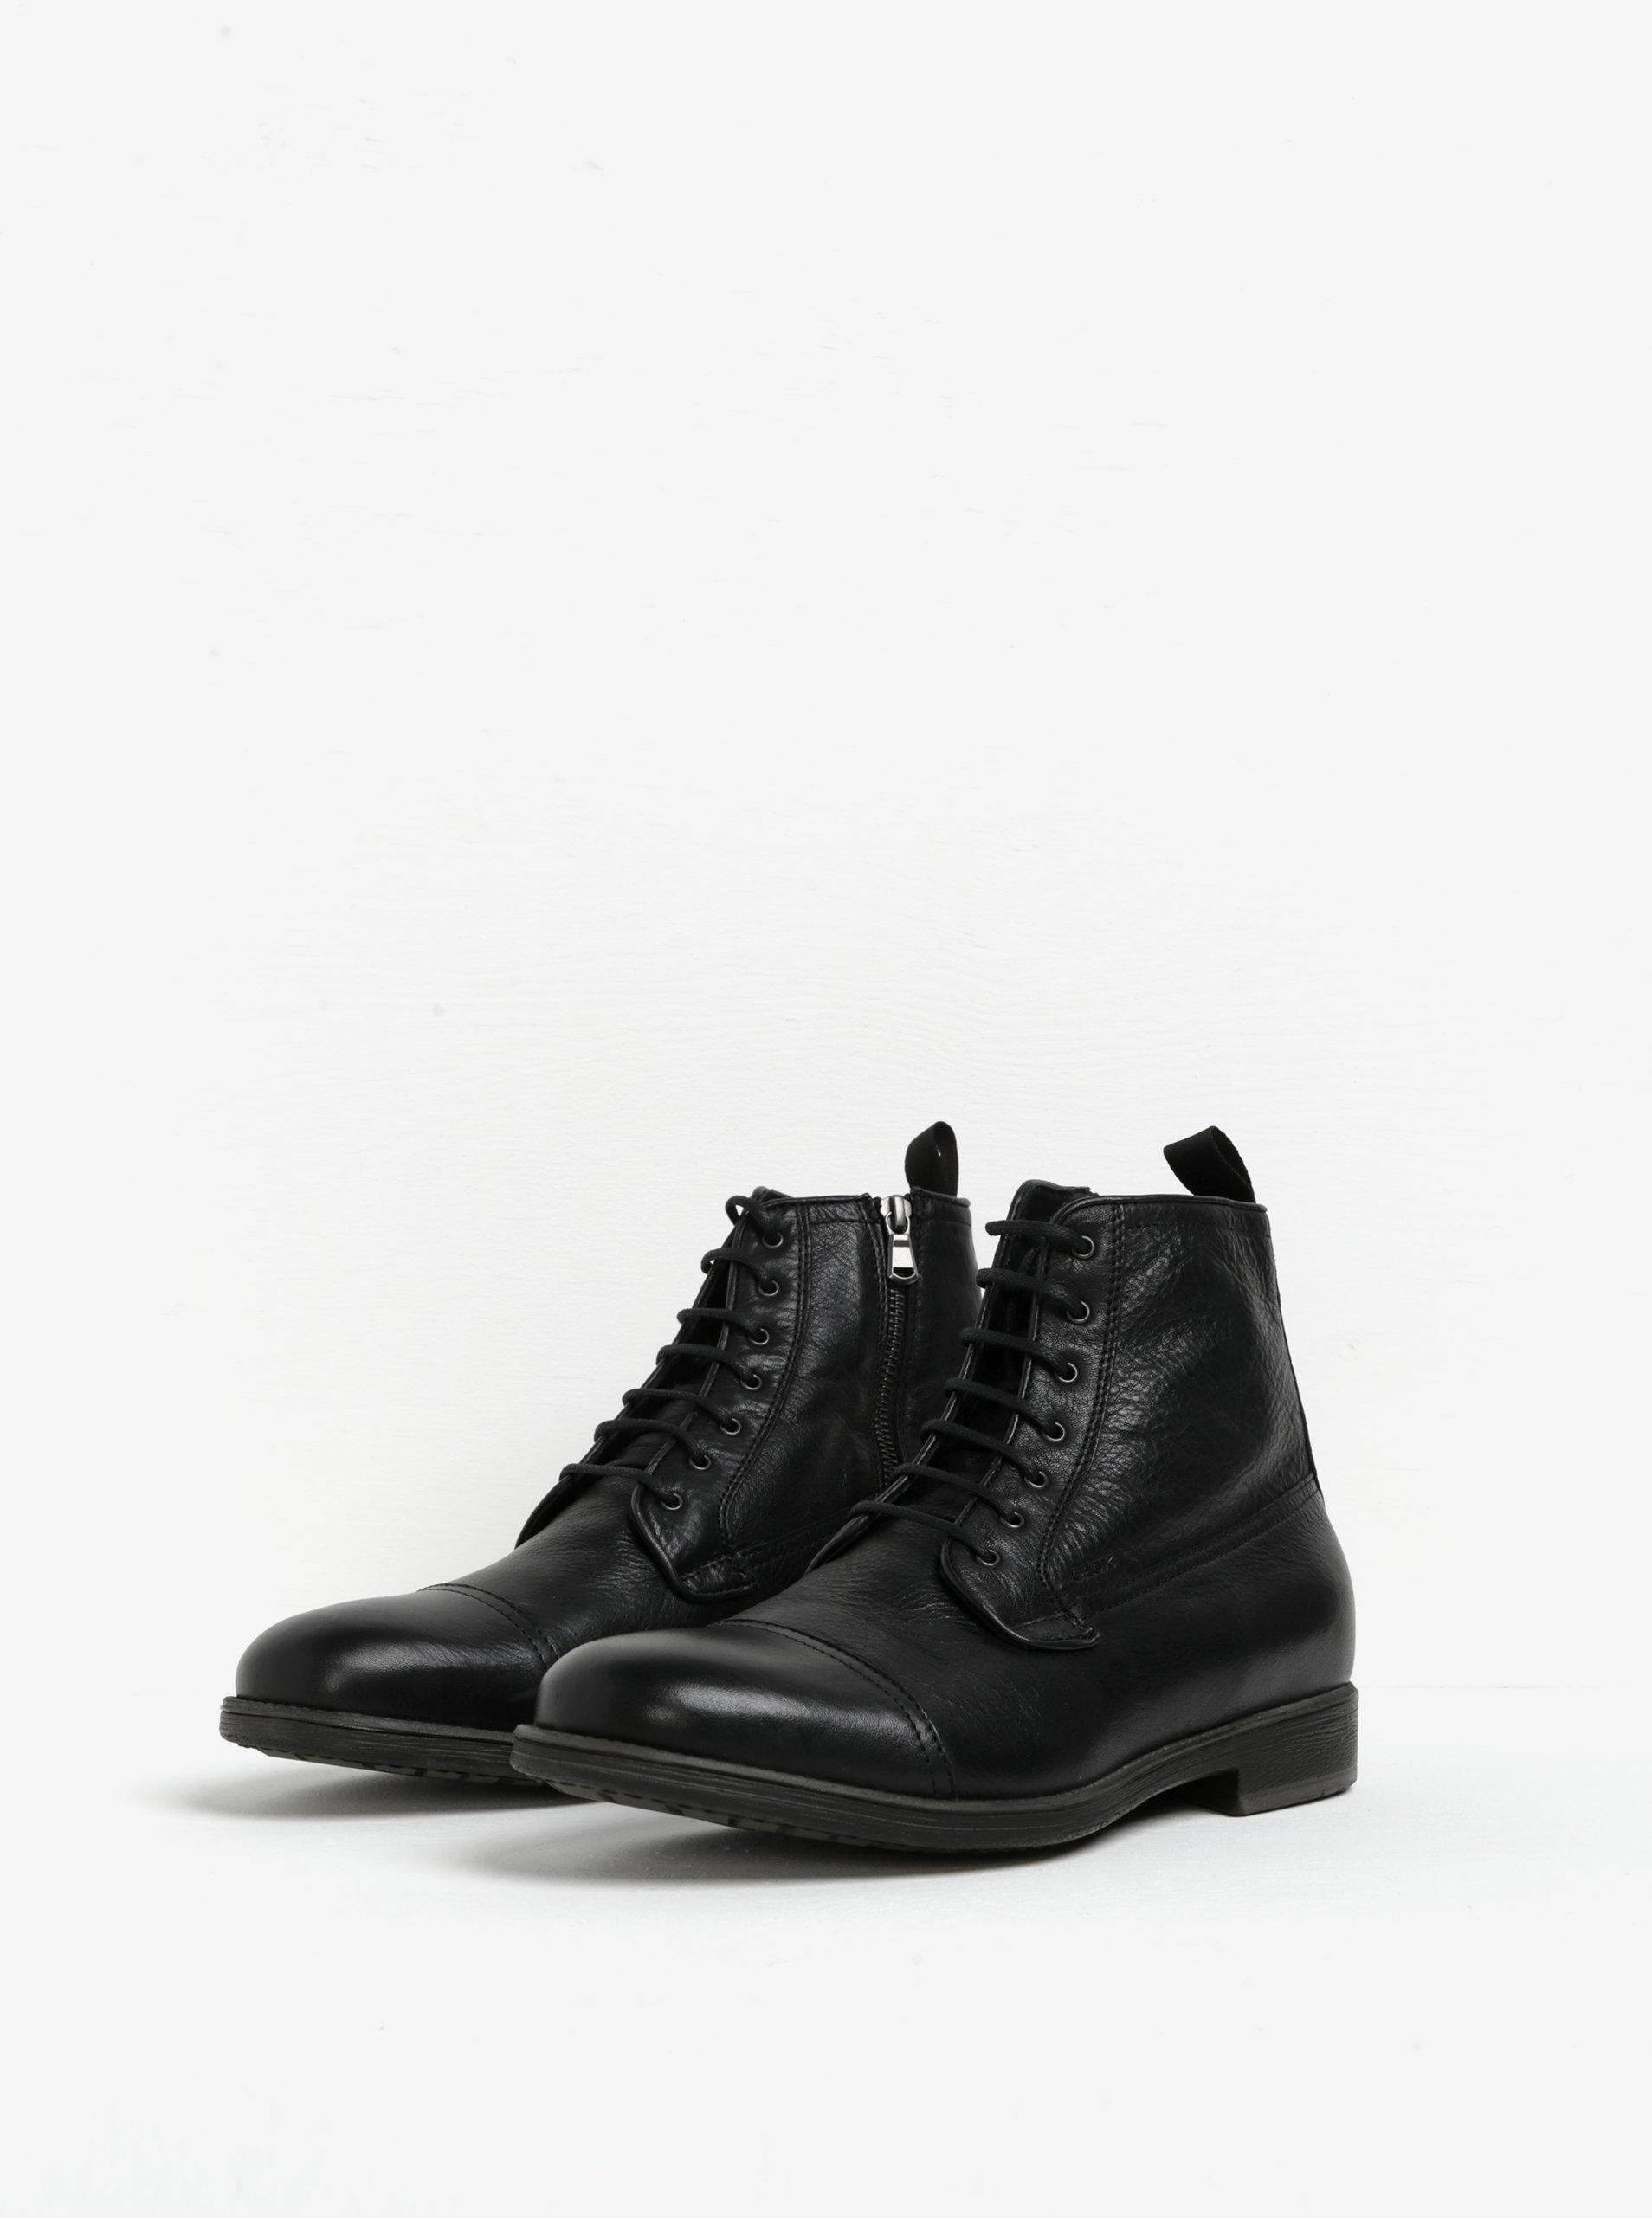 Čierne pánske zateplené kožené topánky Geox Jaylon ... 168c1ad79e